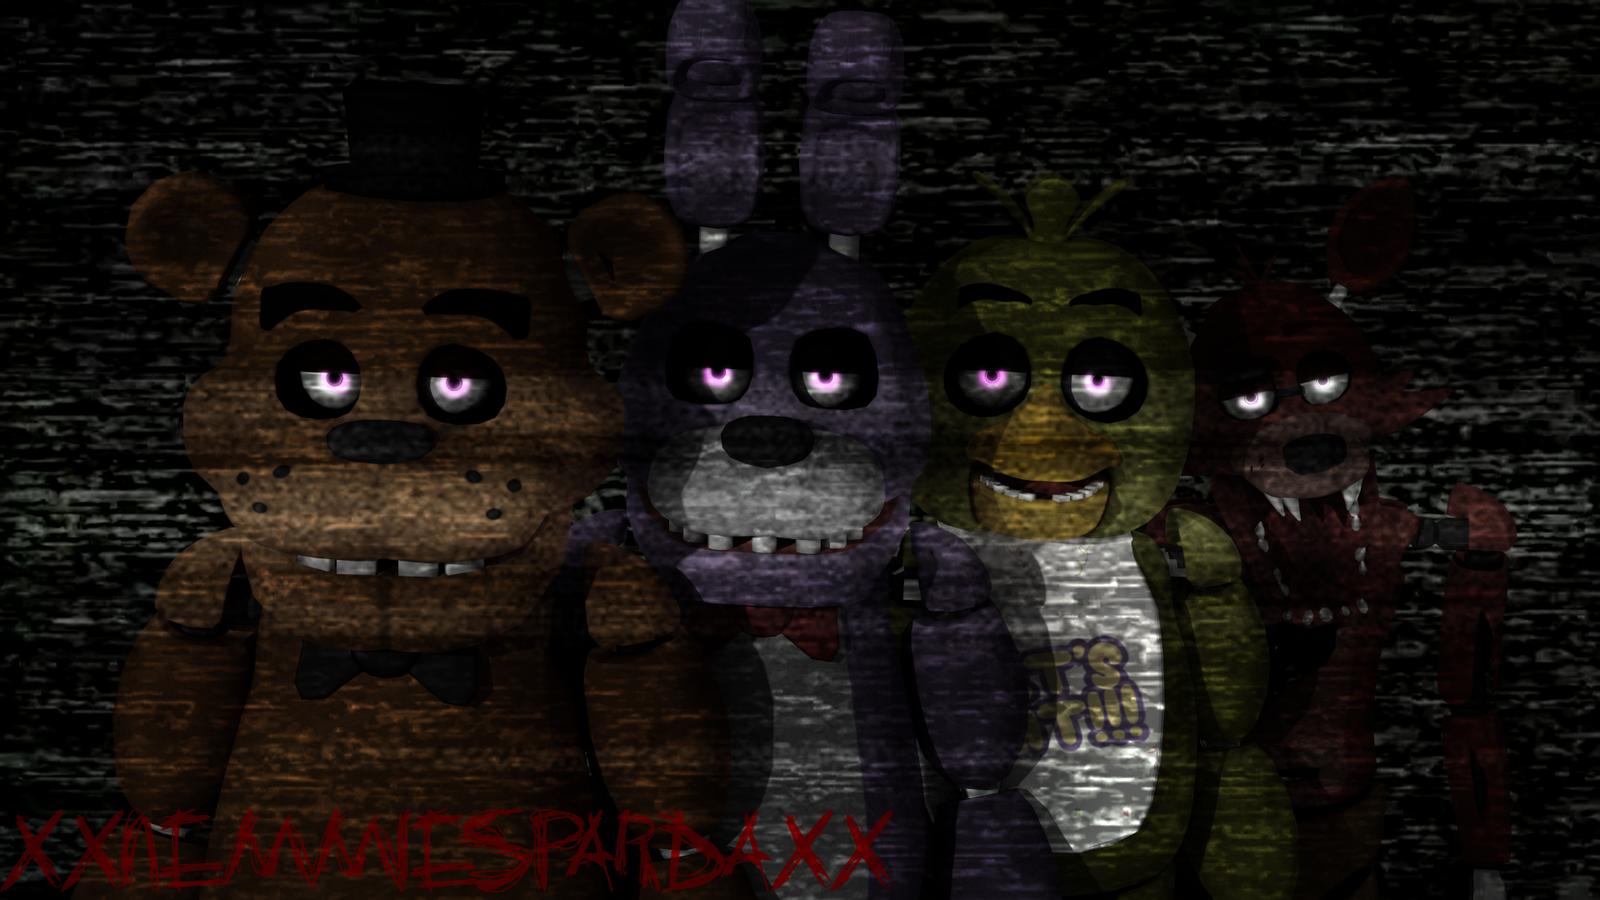 Free Download Five Nights At Freddys By Xxnemmiespardaxx 1600x900